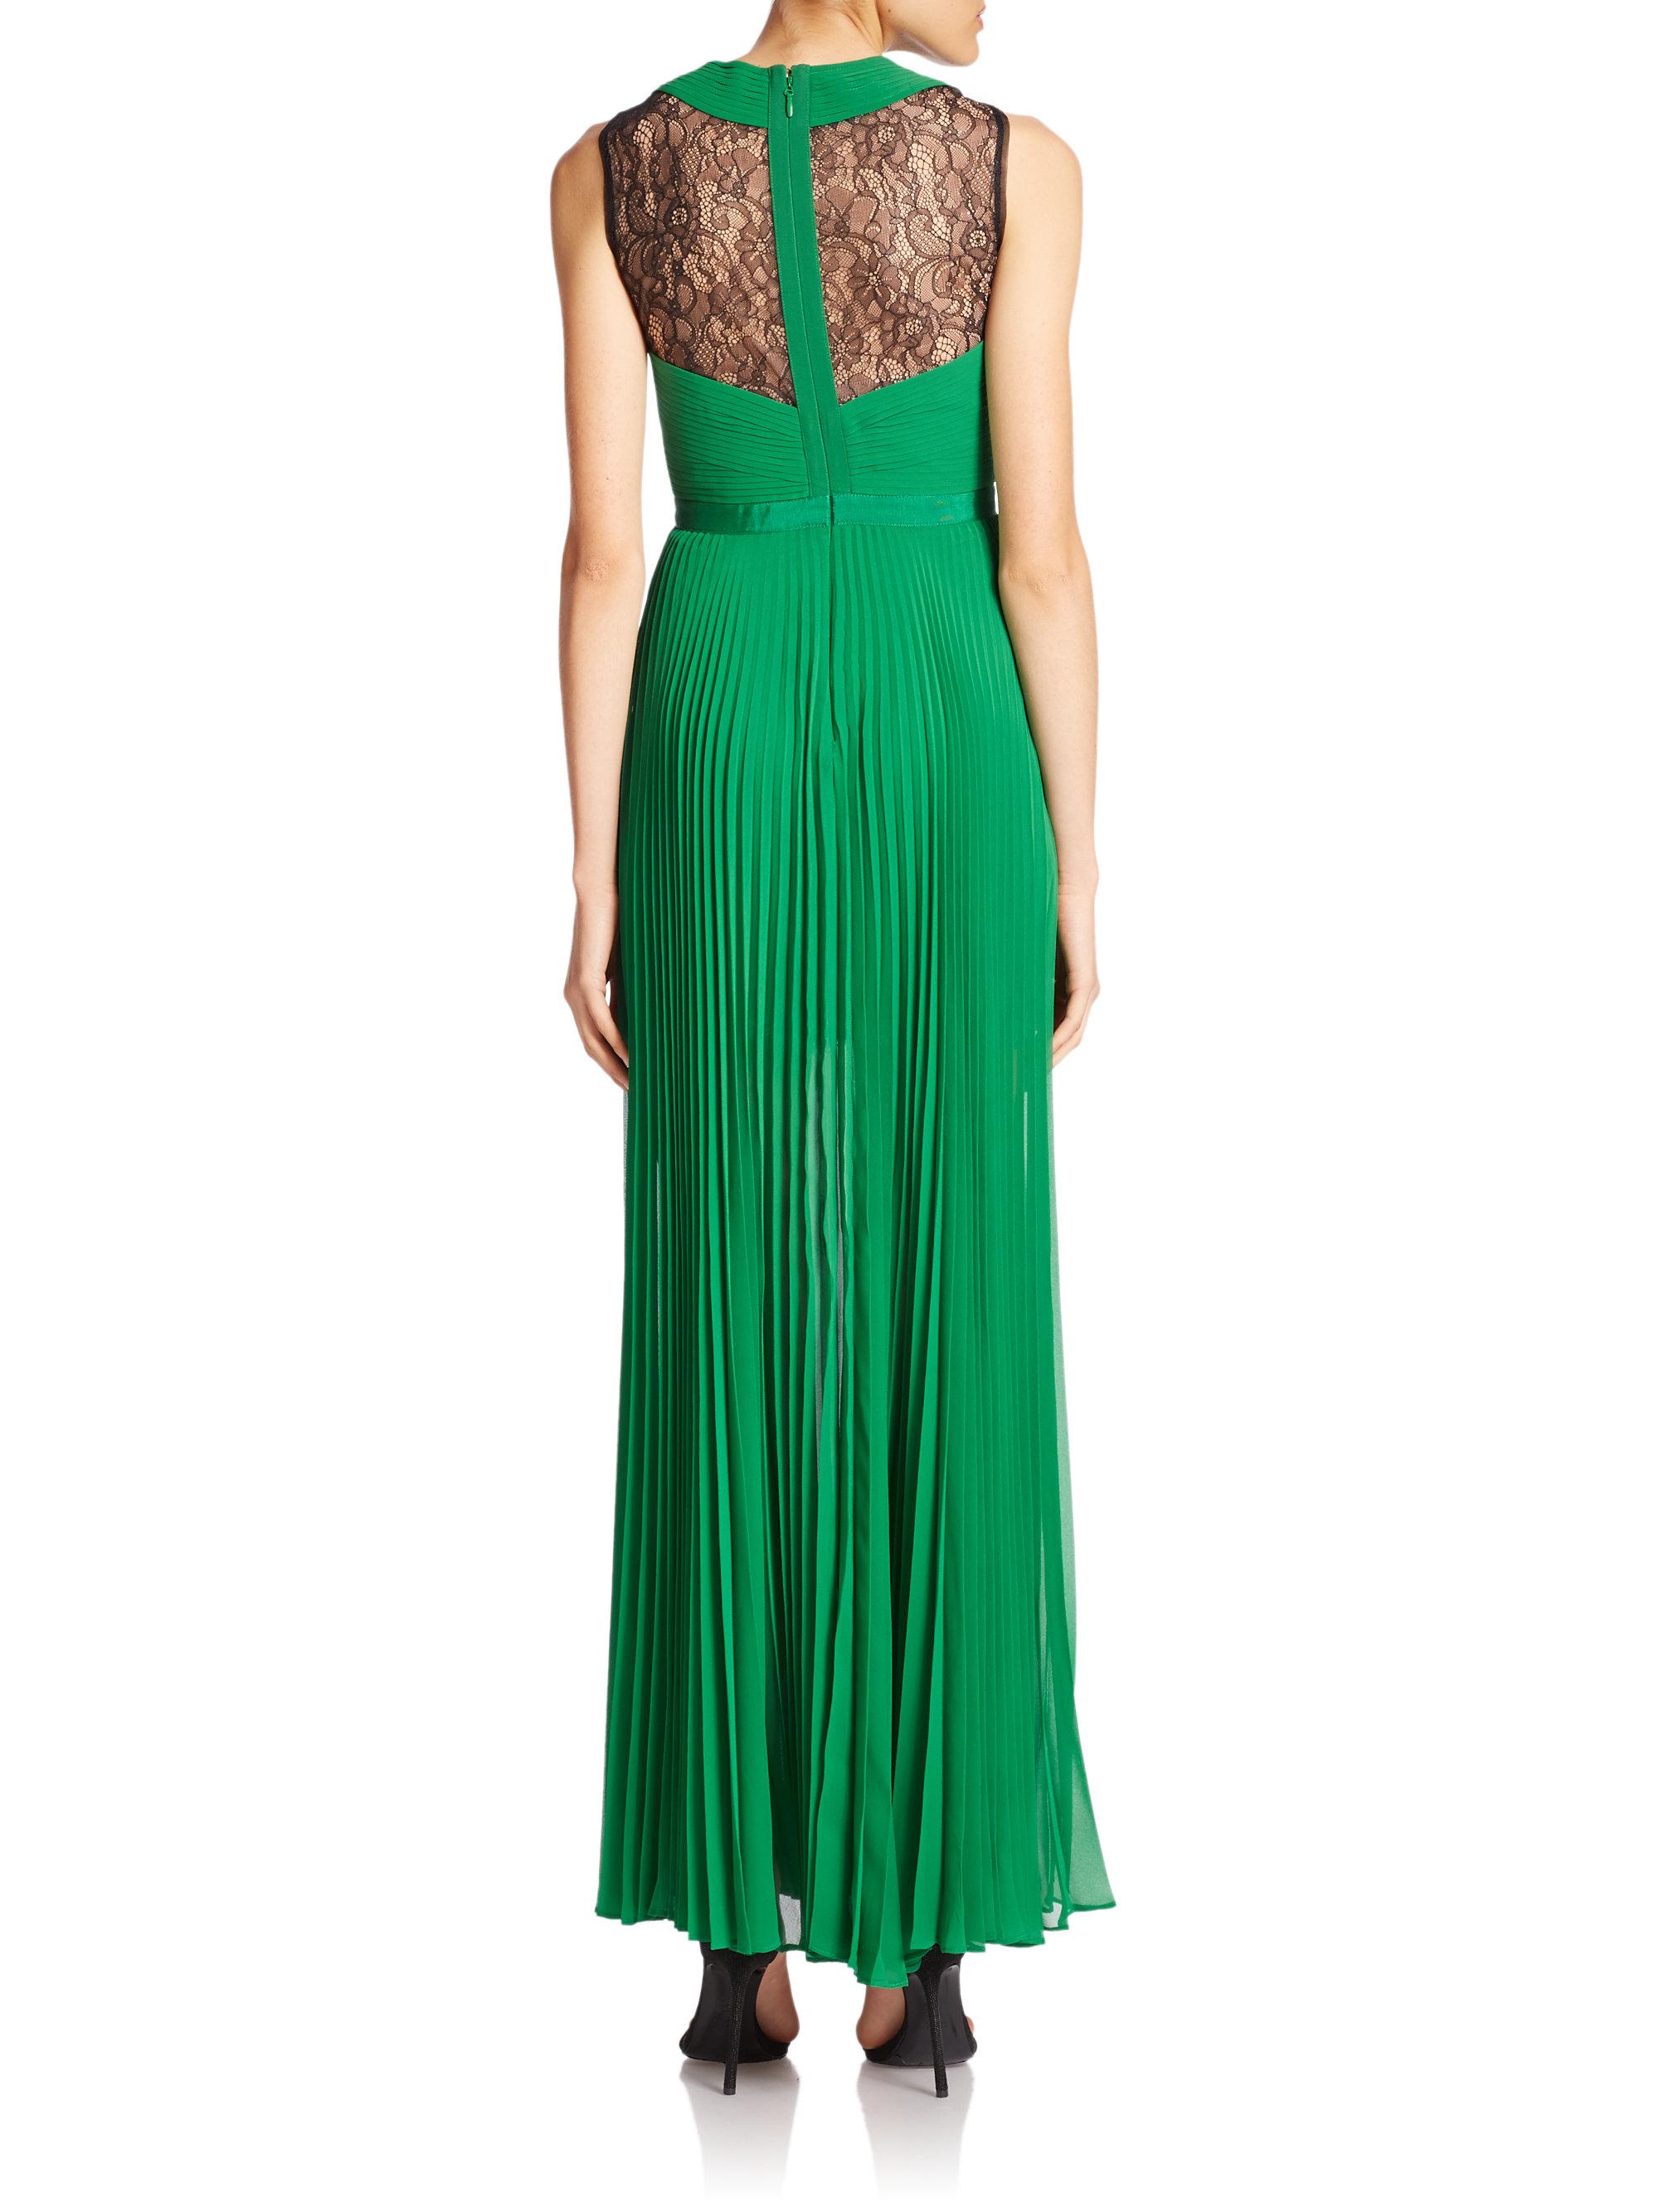 Lyst - Bcbgmaxazria Caia Pleated Illusion Dress in Green